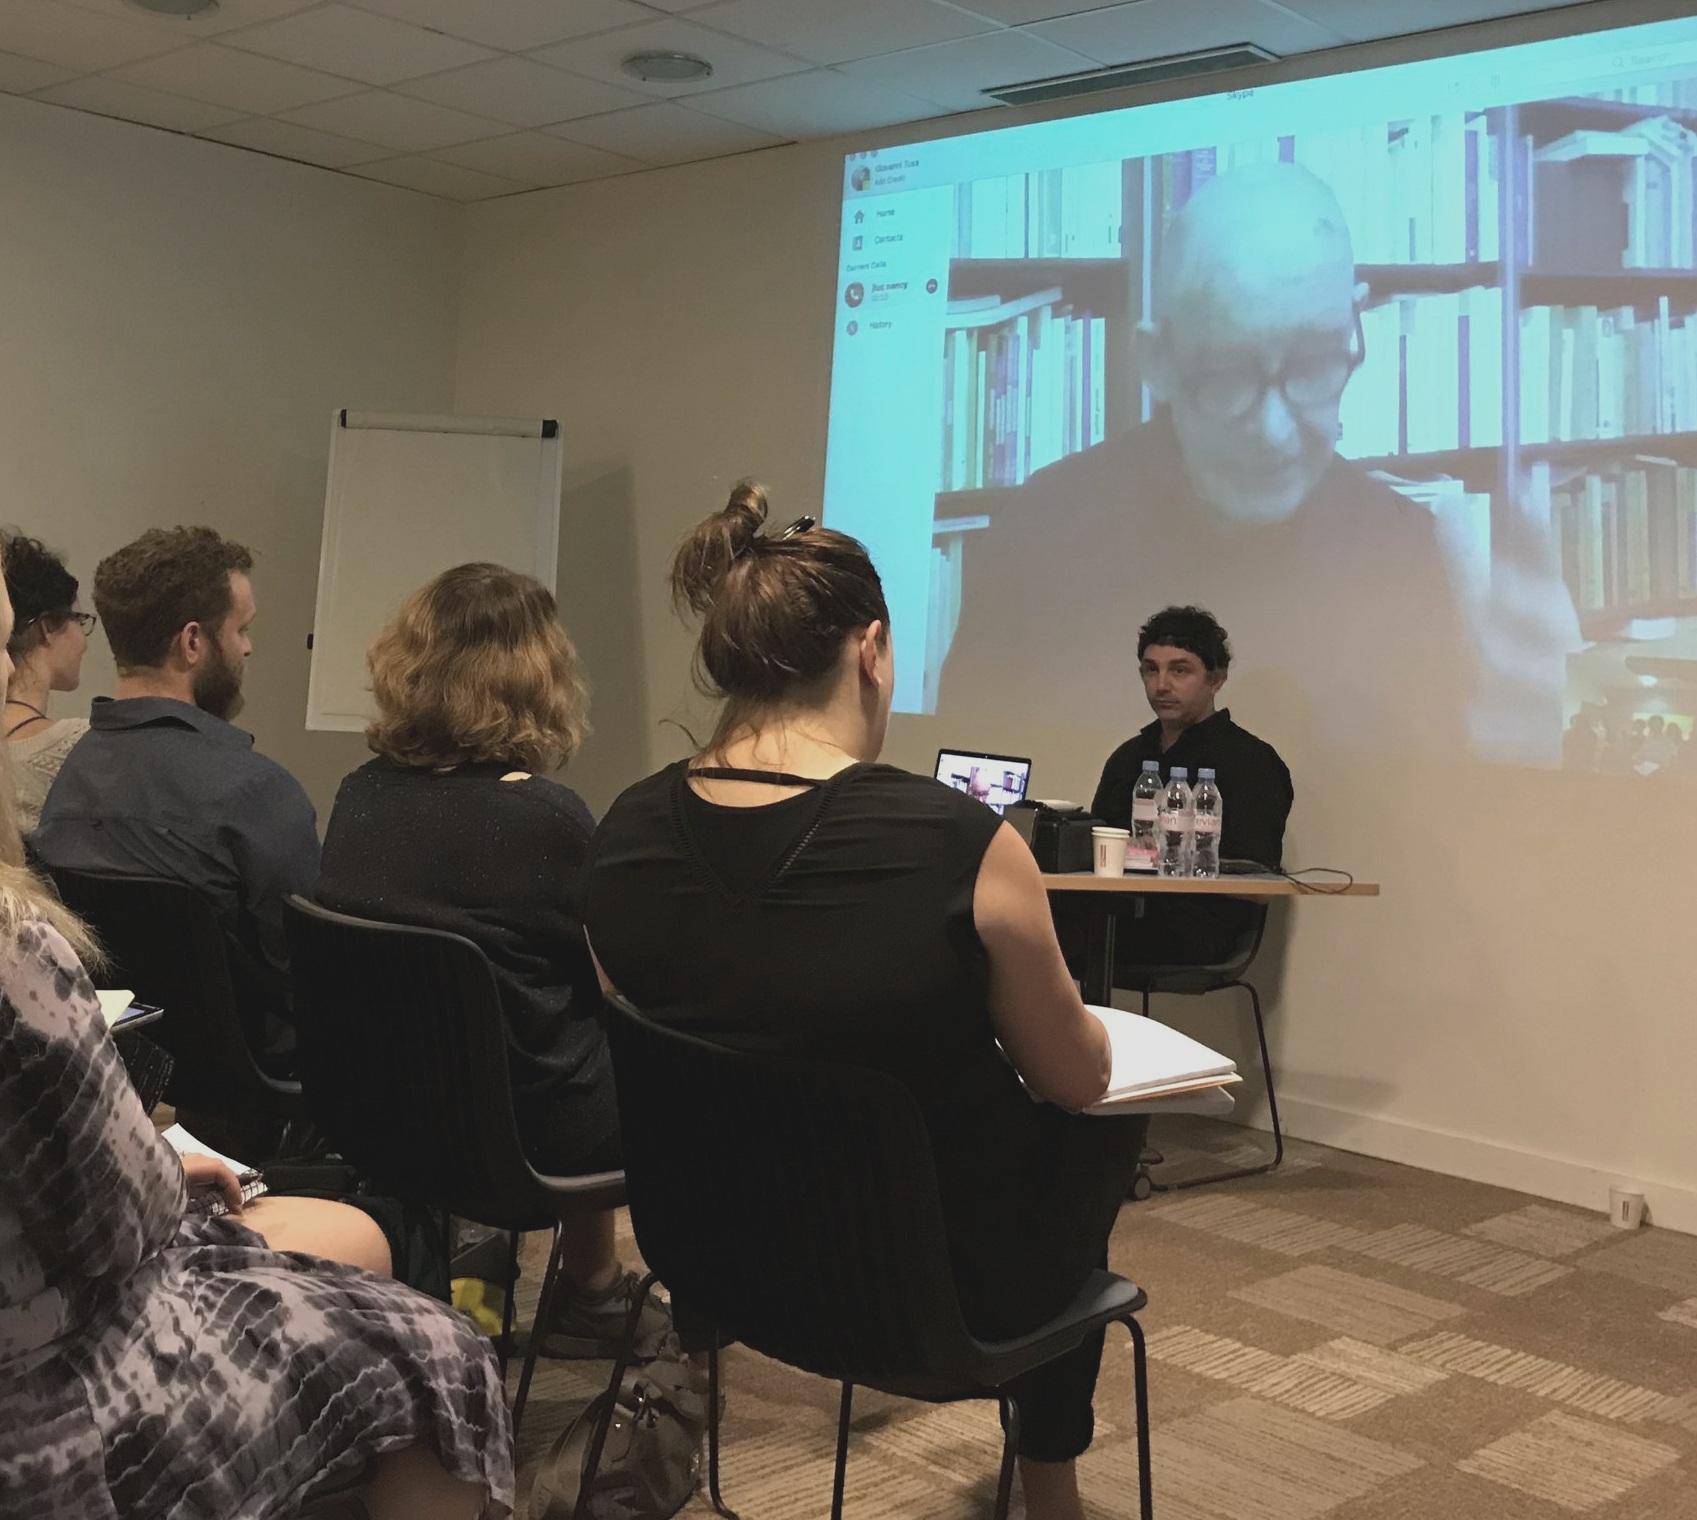 Visiting Faculty Dr. Jean-Luc Nancy (via Skype) and Dr. Giovanni Tusa, Paris 2018. Photo by Molly Davis